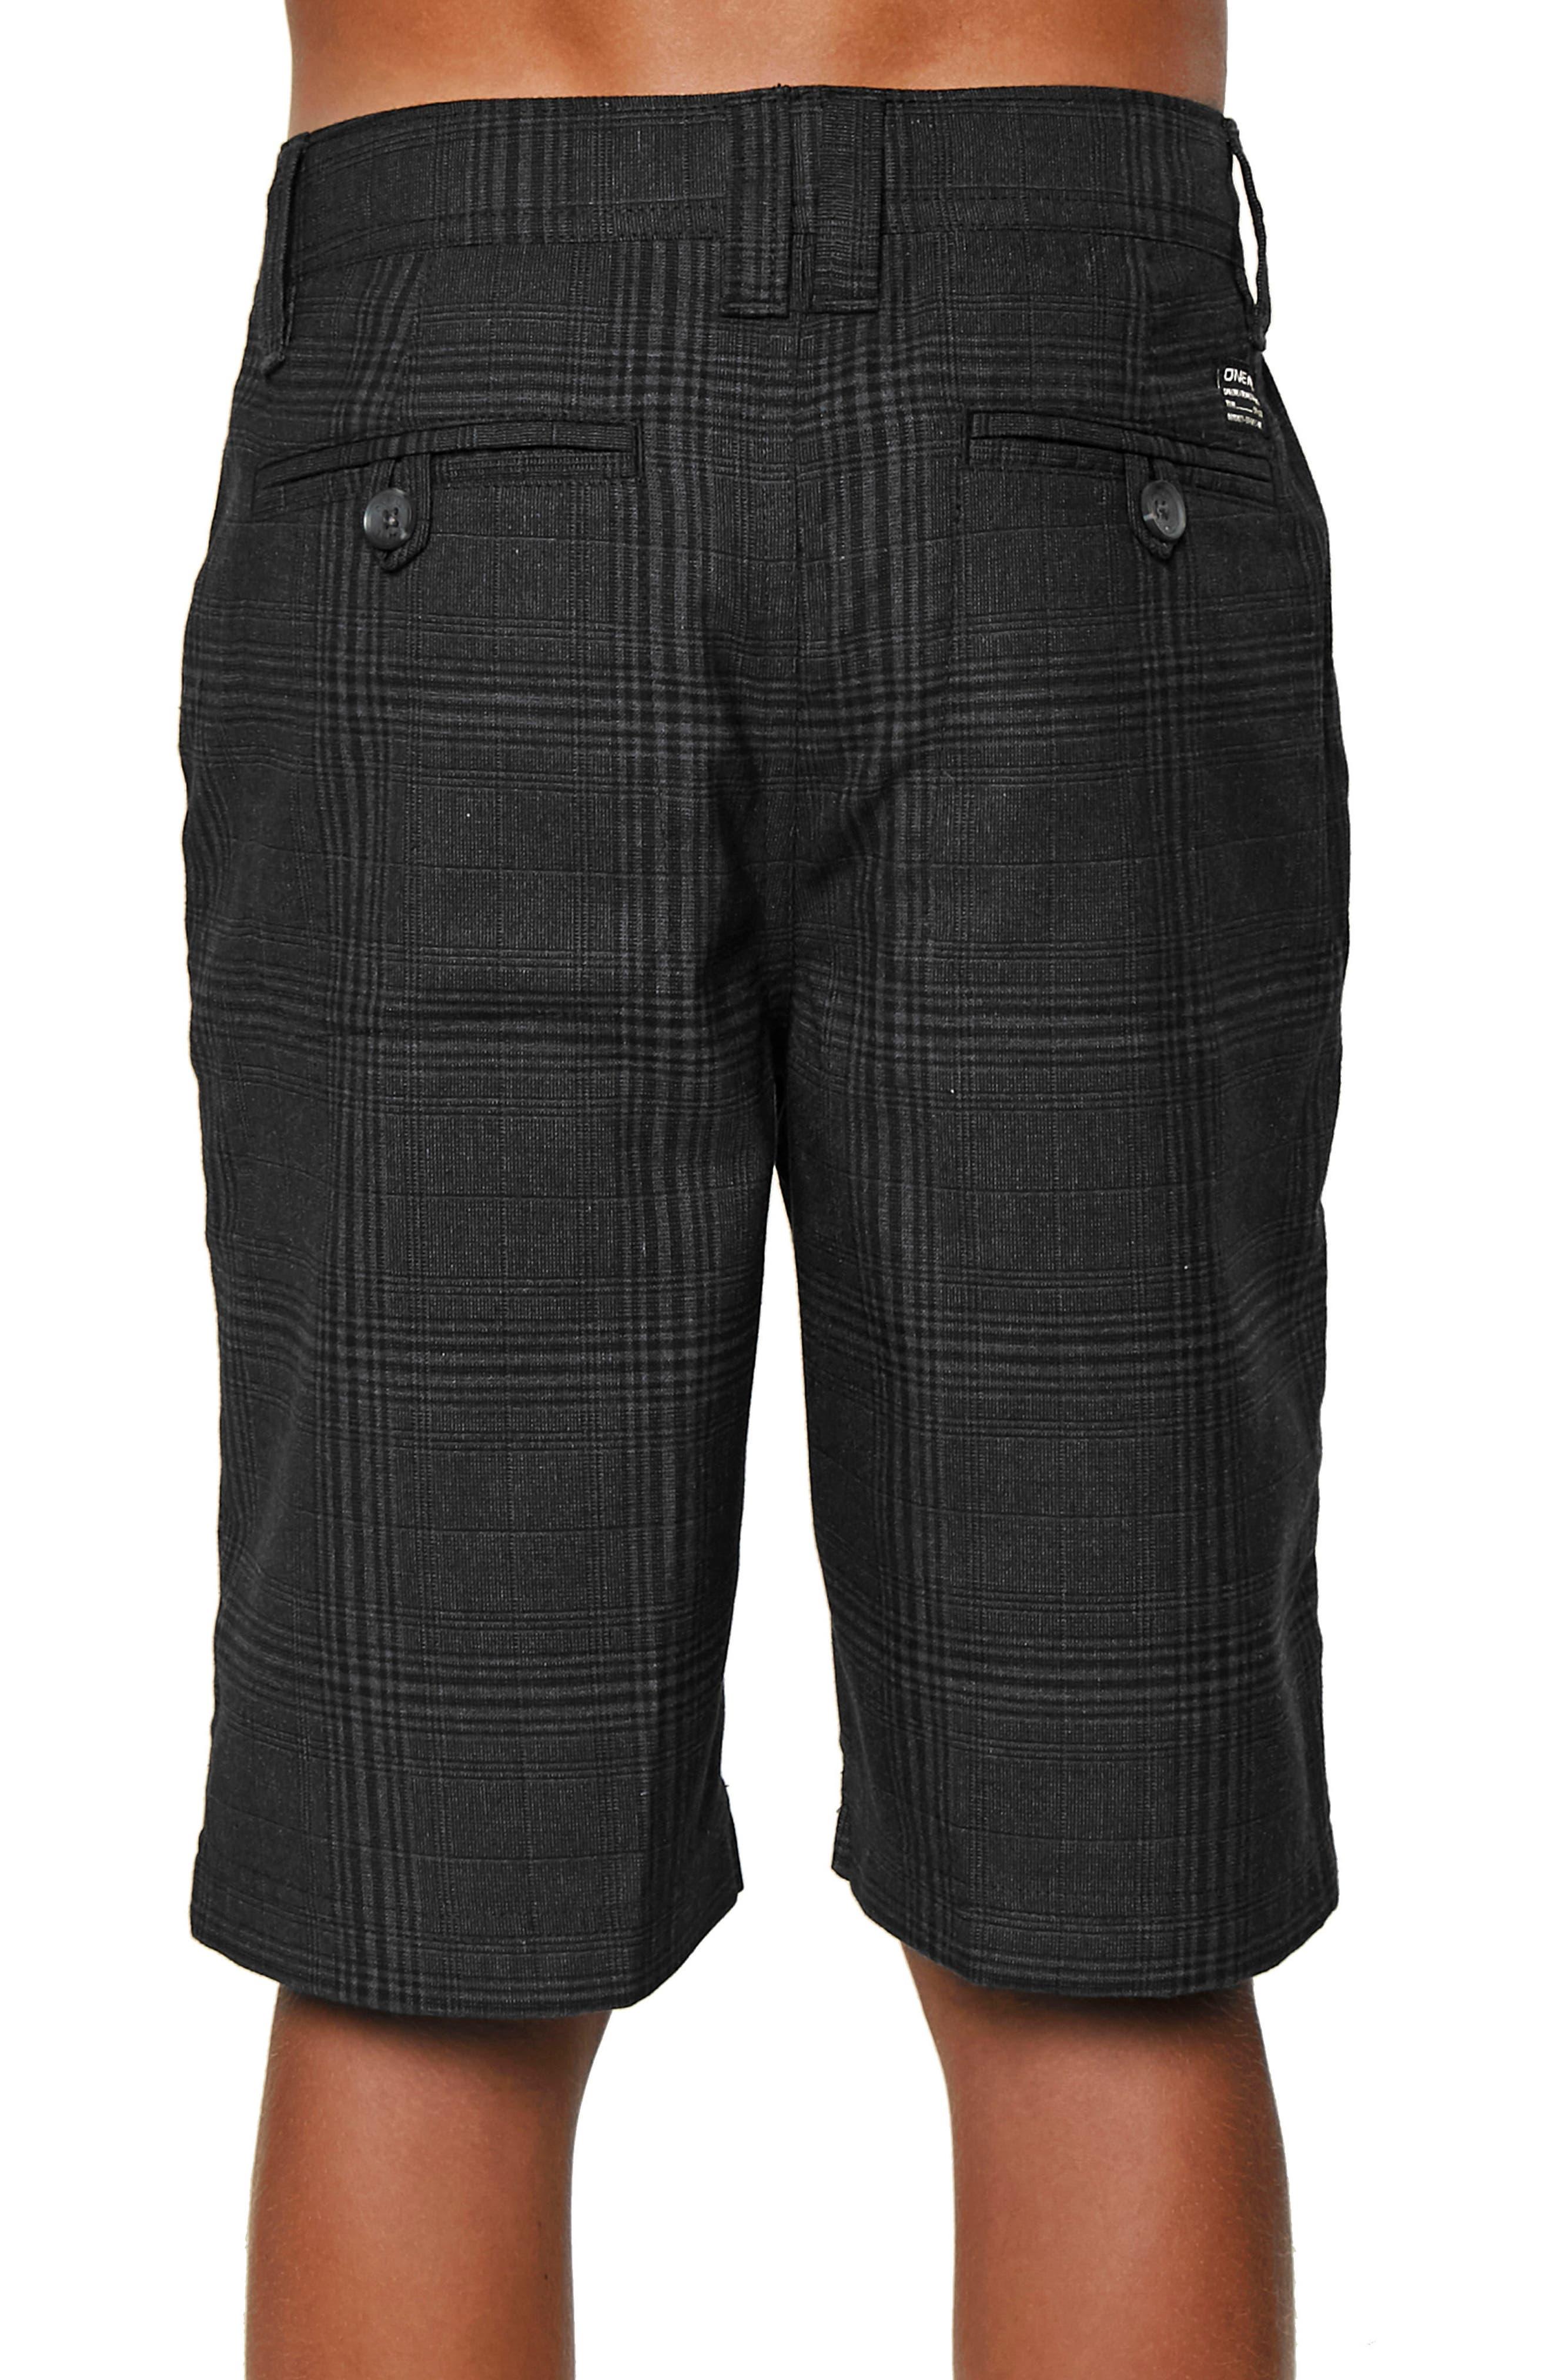 Bristol Plaid Shorts,                             Alternate thumbnail 3, color,                             001